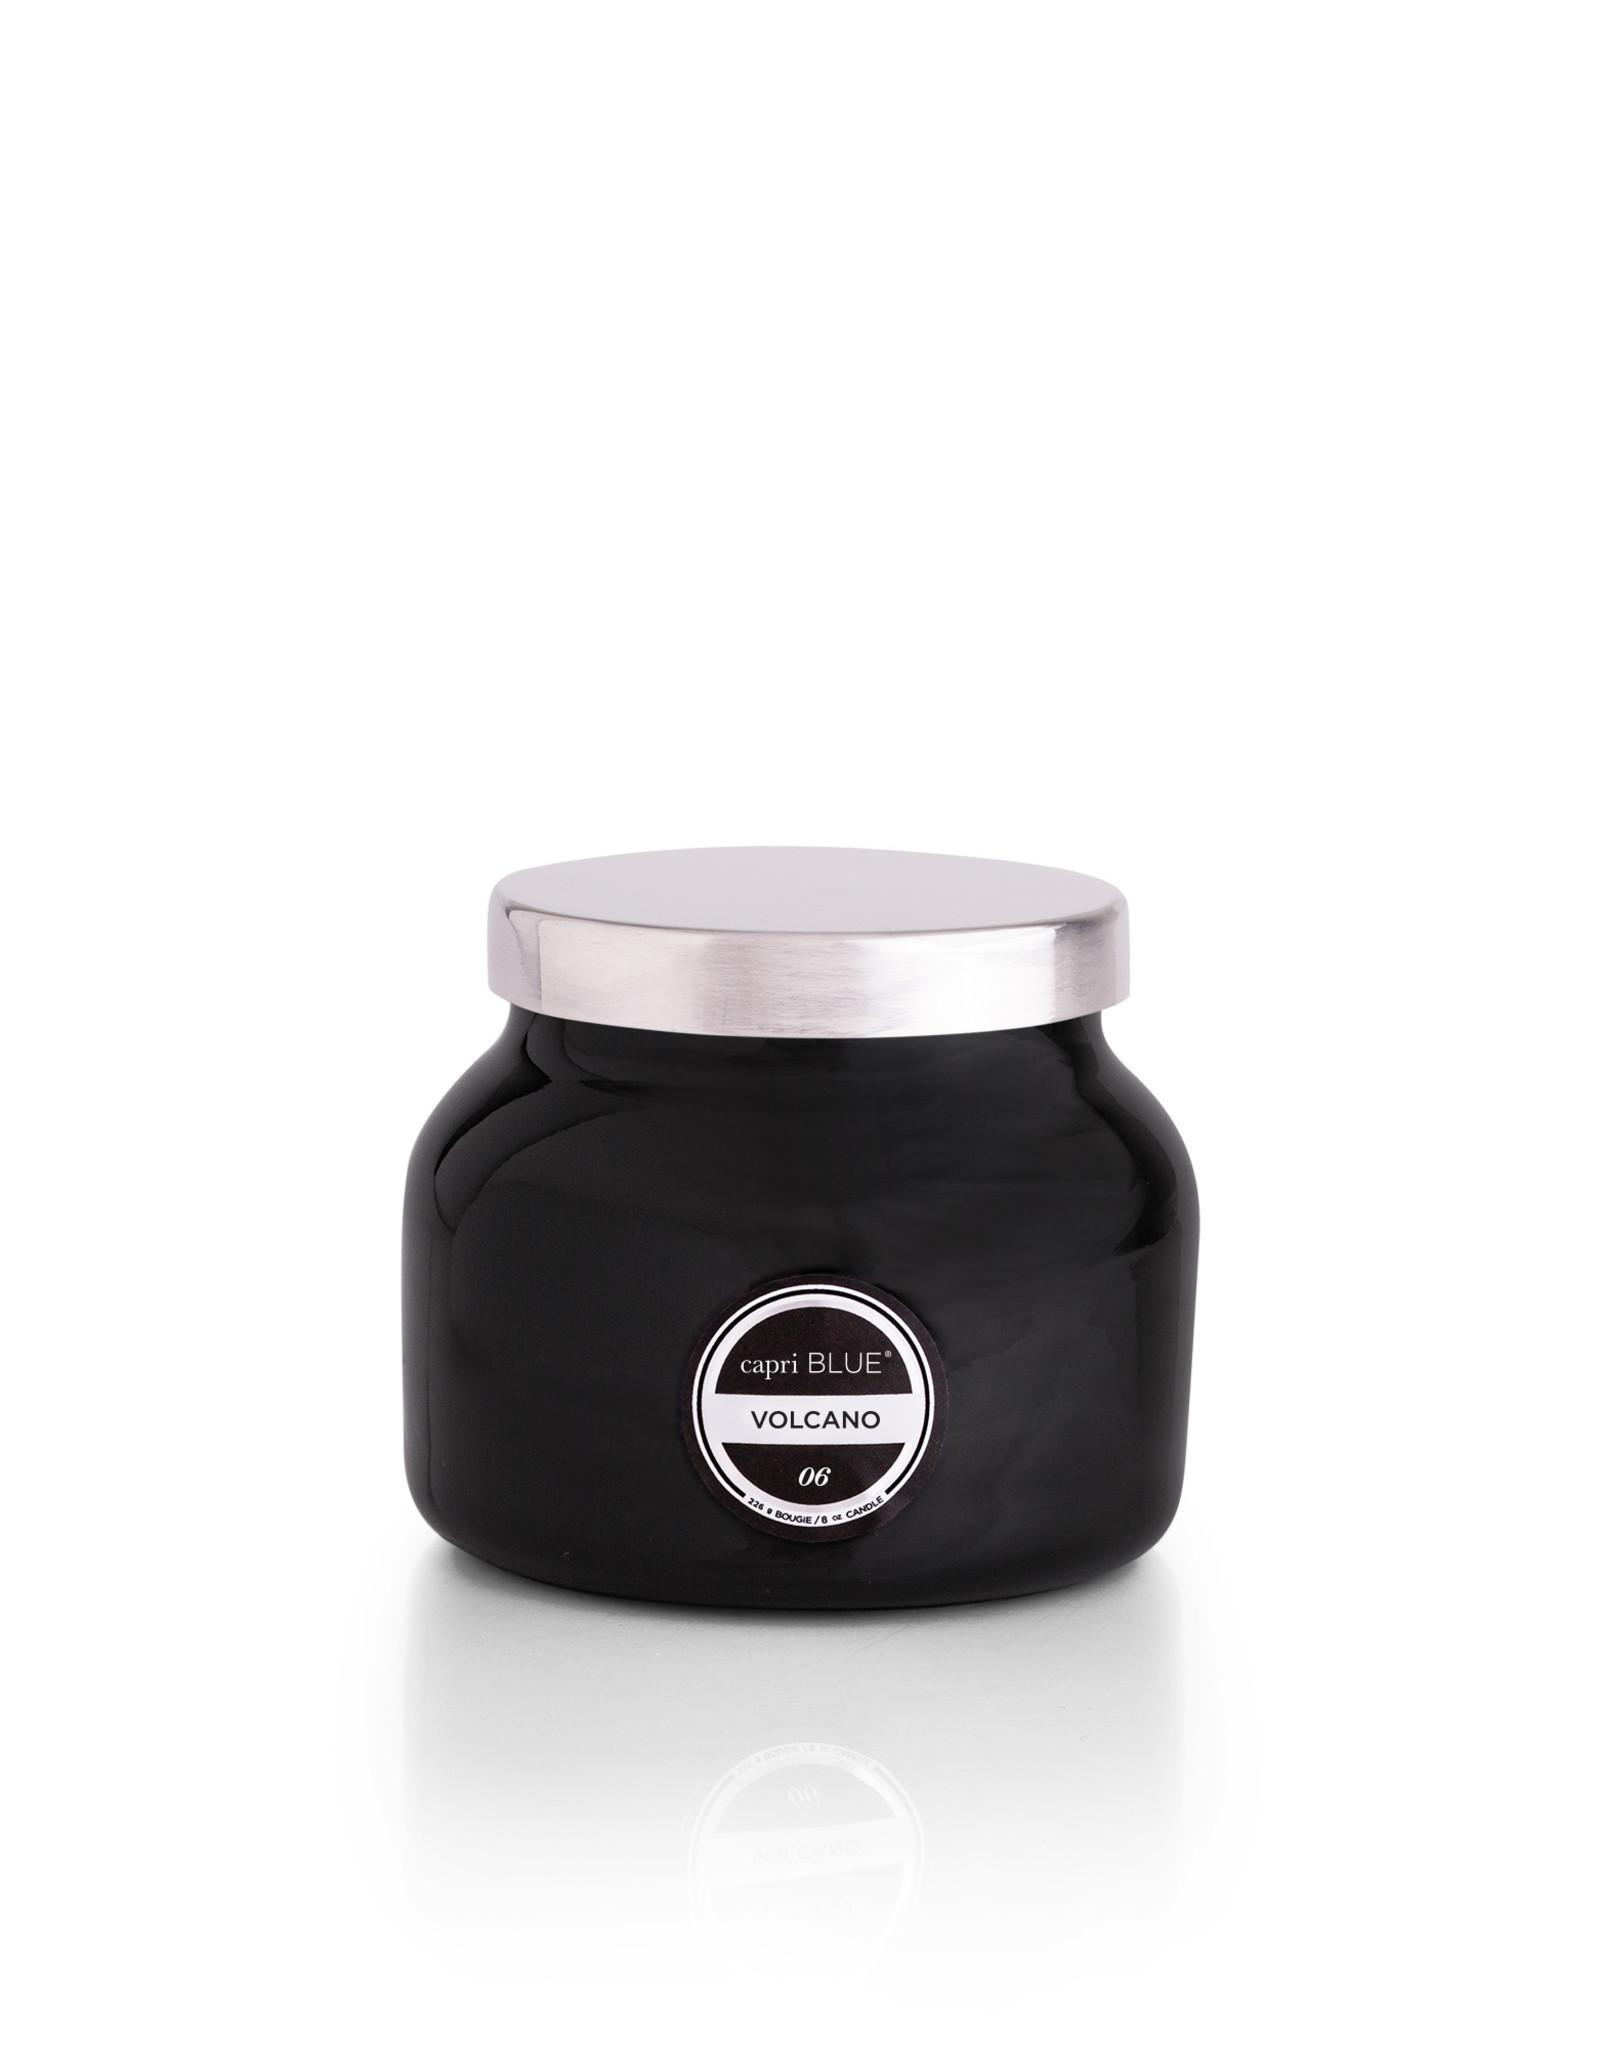 8oz Capri Blue Petite Jar